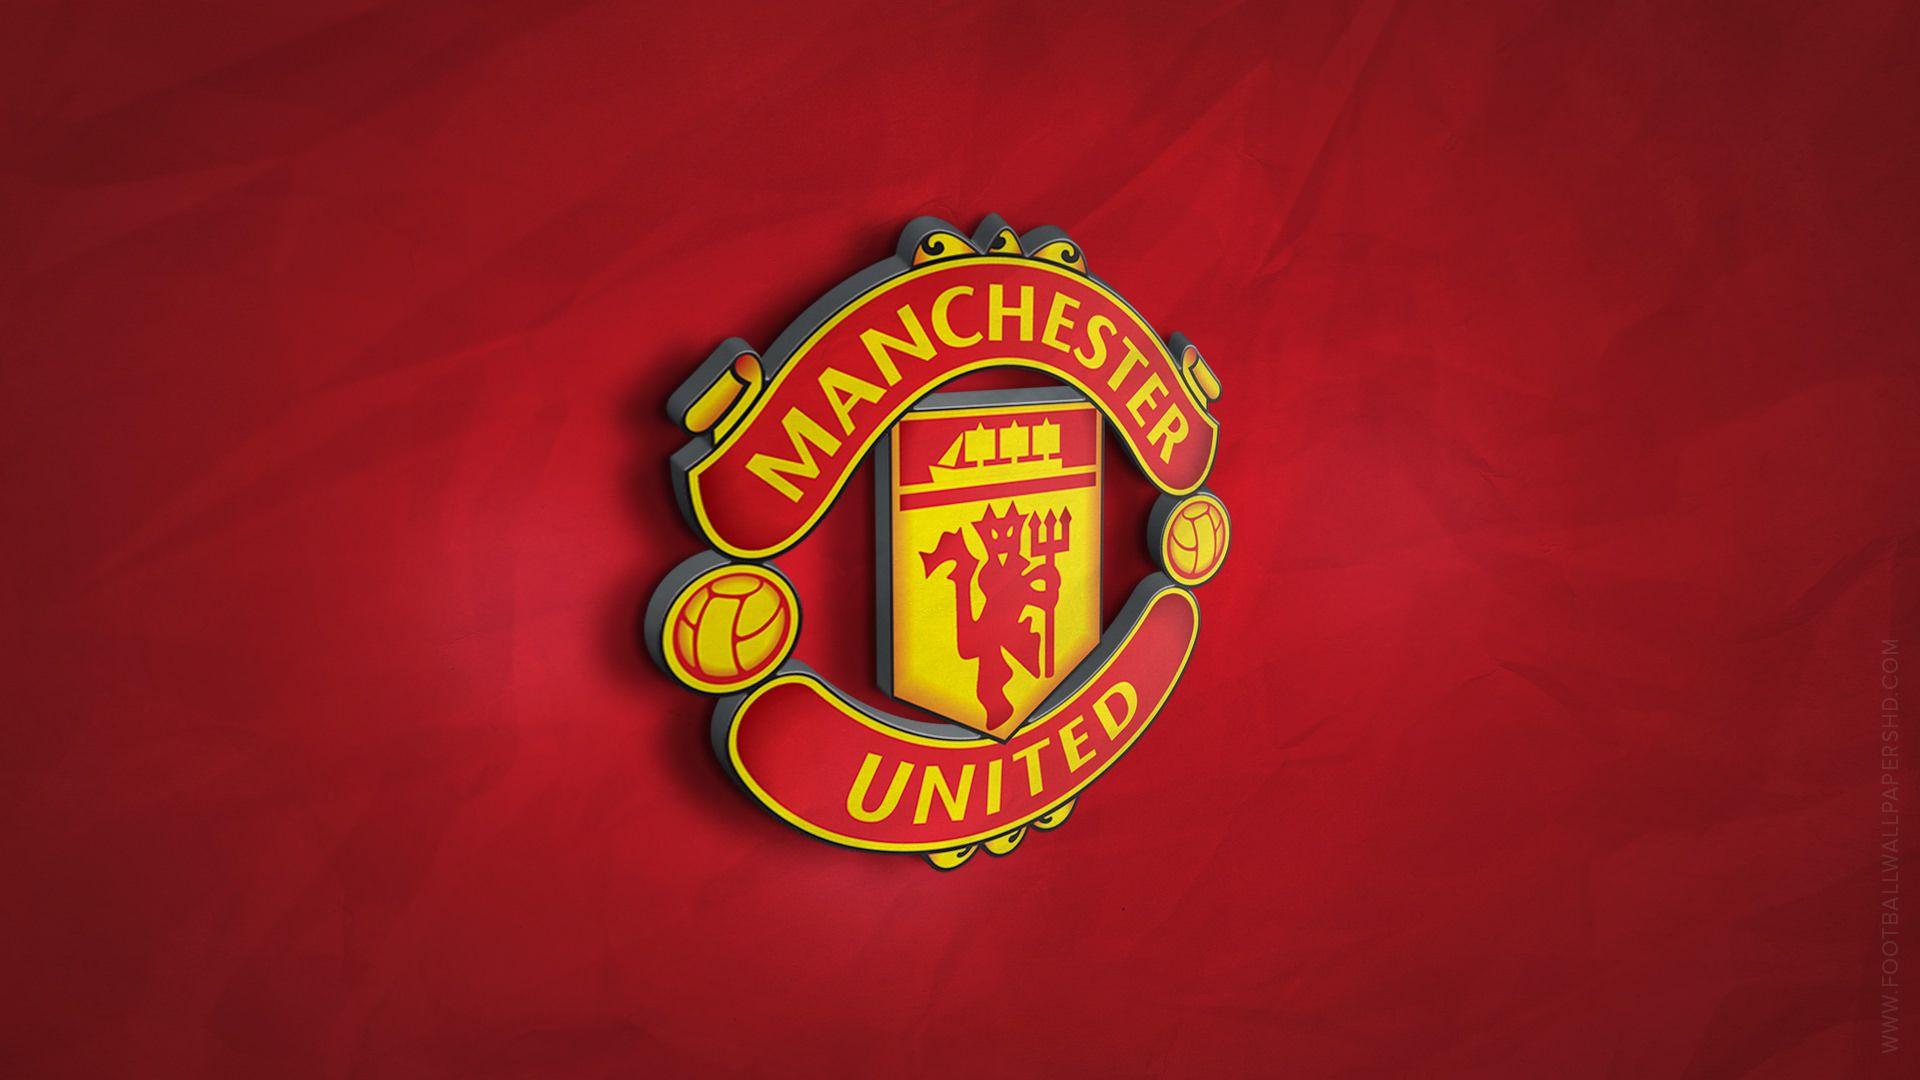 Manchester United 3D Logo Wallpaper Football Wallpapers